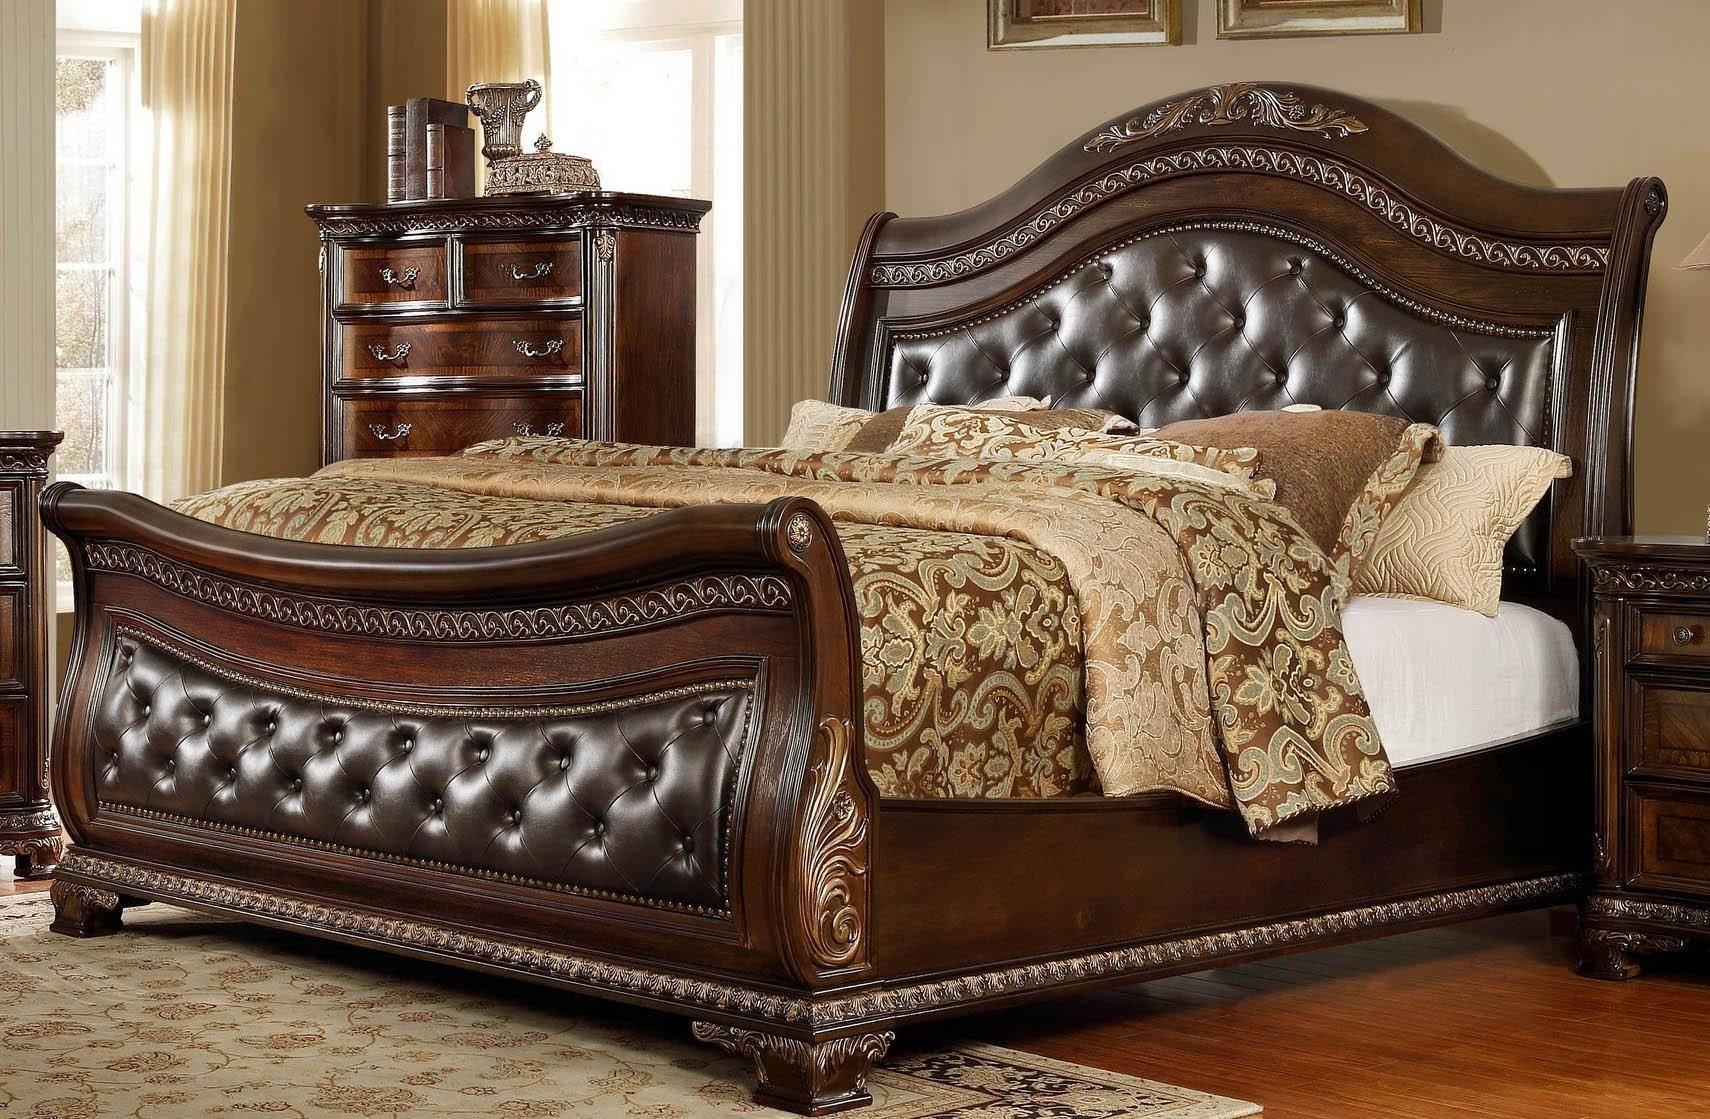 King Size Bedroom Set for Sale Luxury Mcferran B9588 King Sleigh Bed In Oak Veneers Dark Cherry Finish Leather